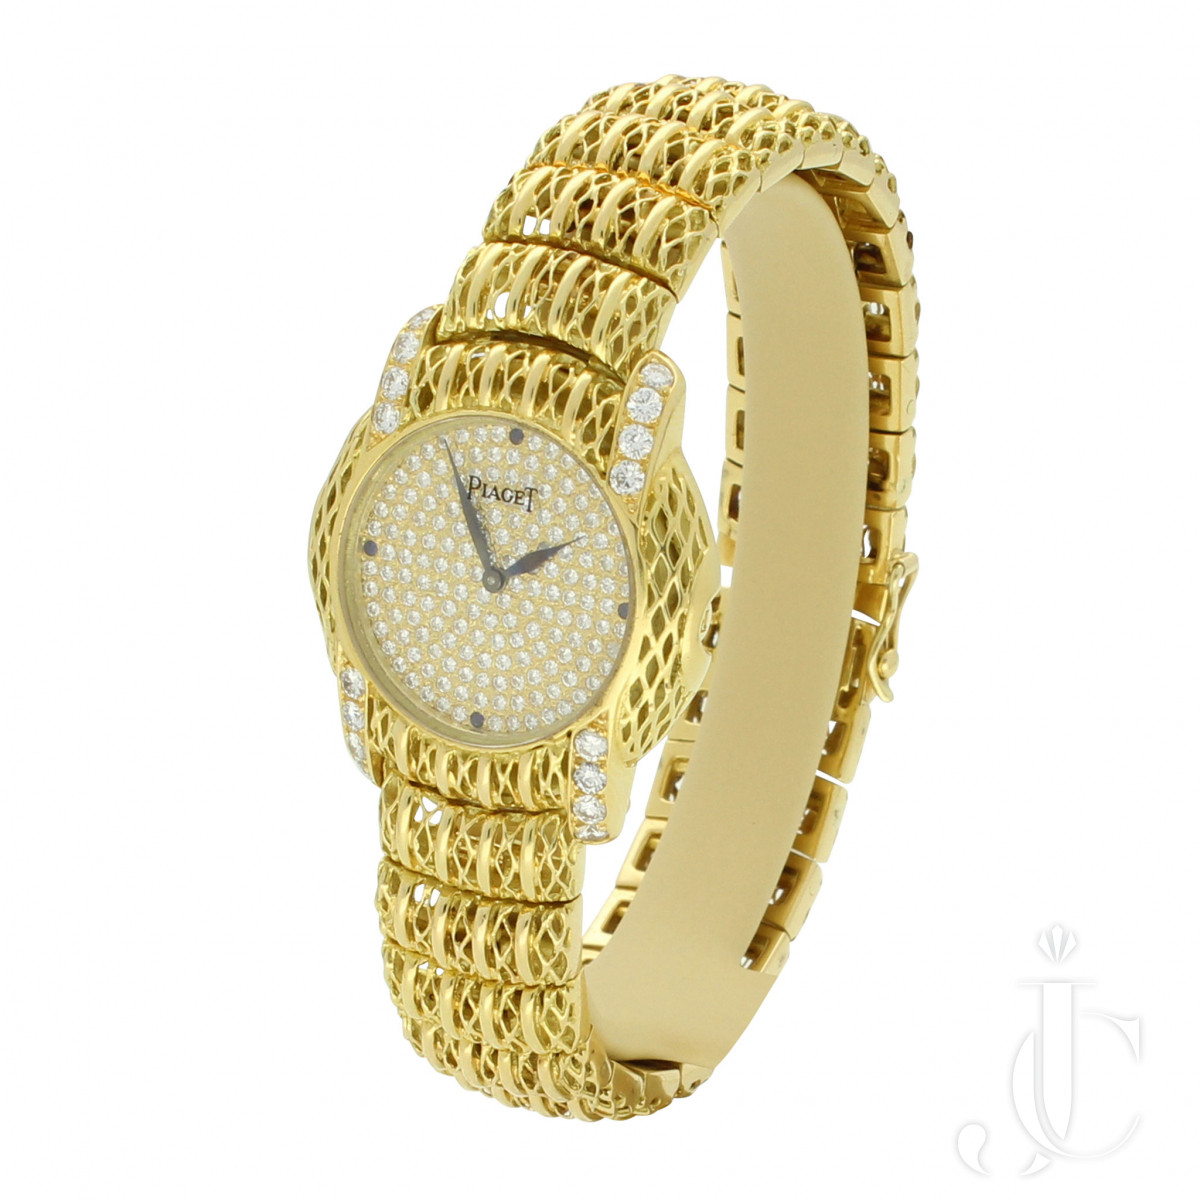 Piaget Gold and Diamond Bracelet Watch